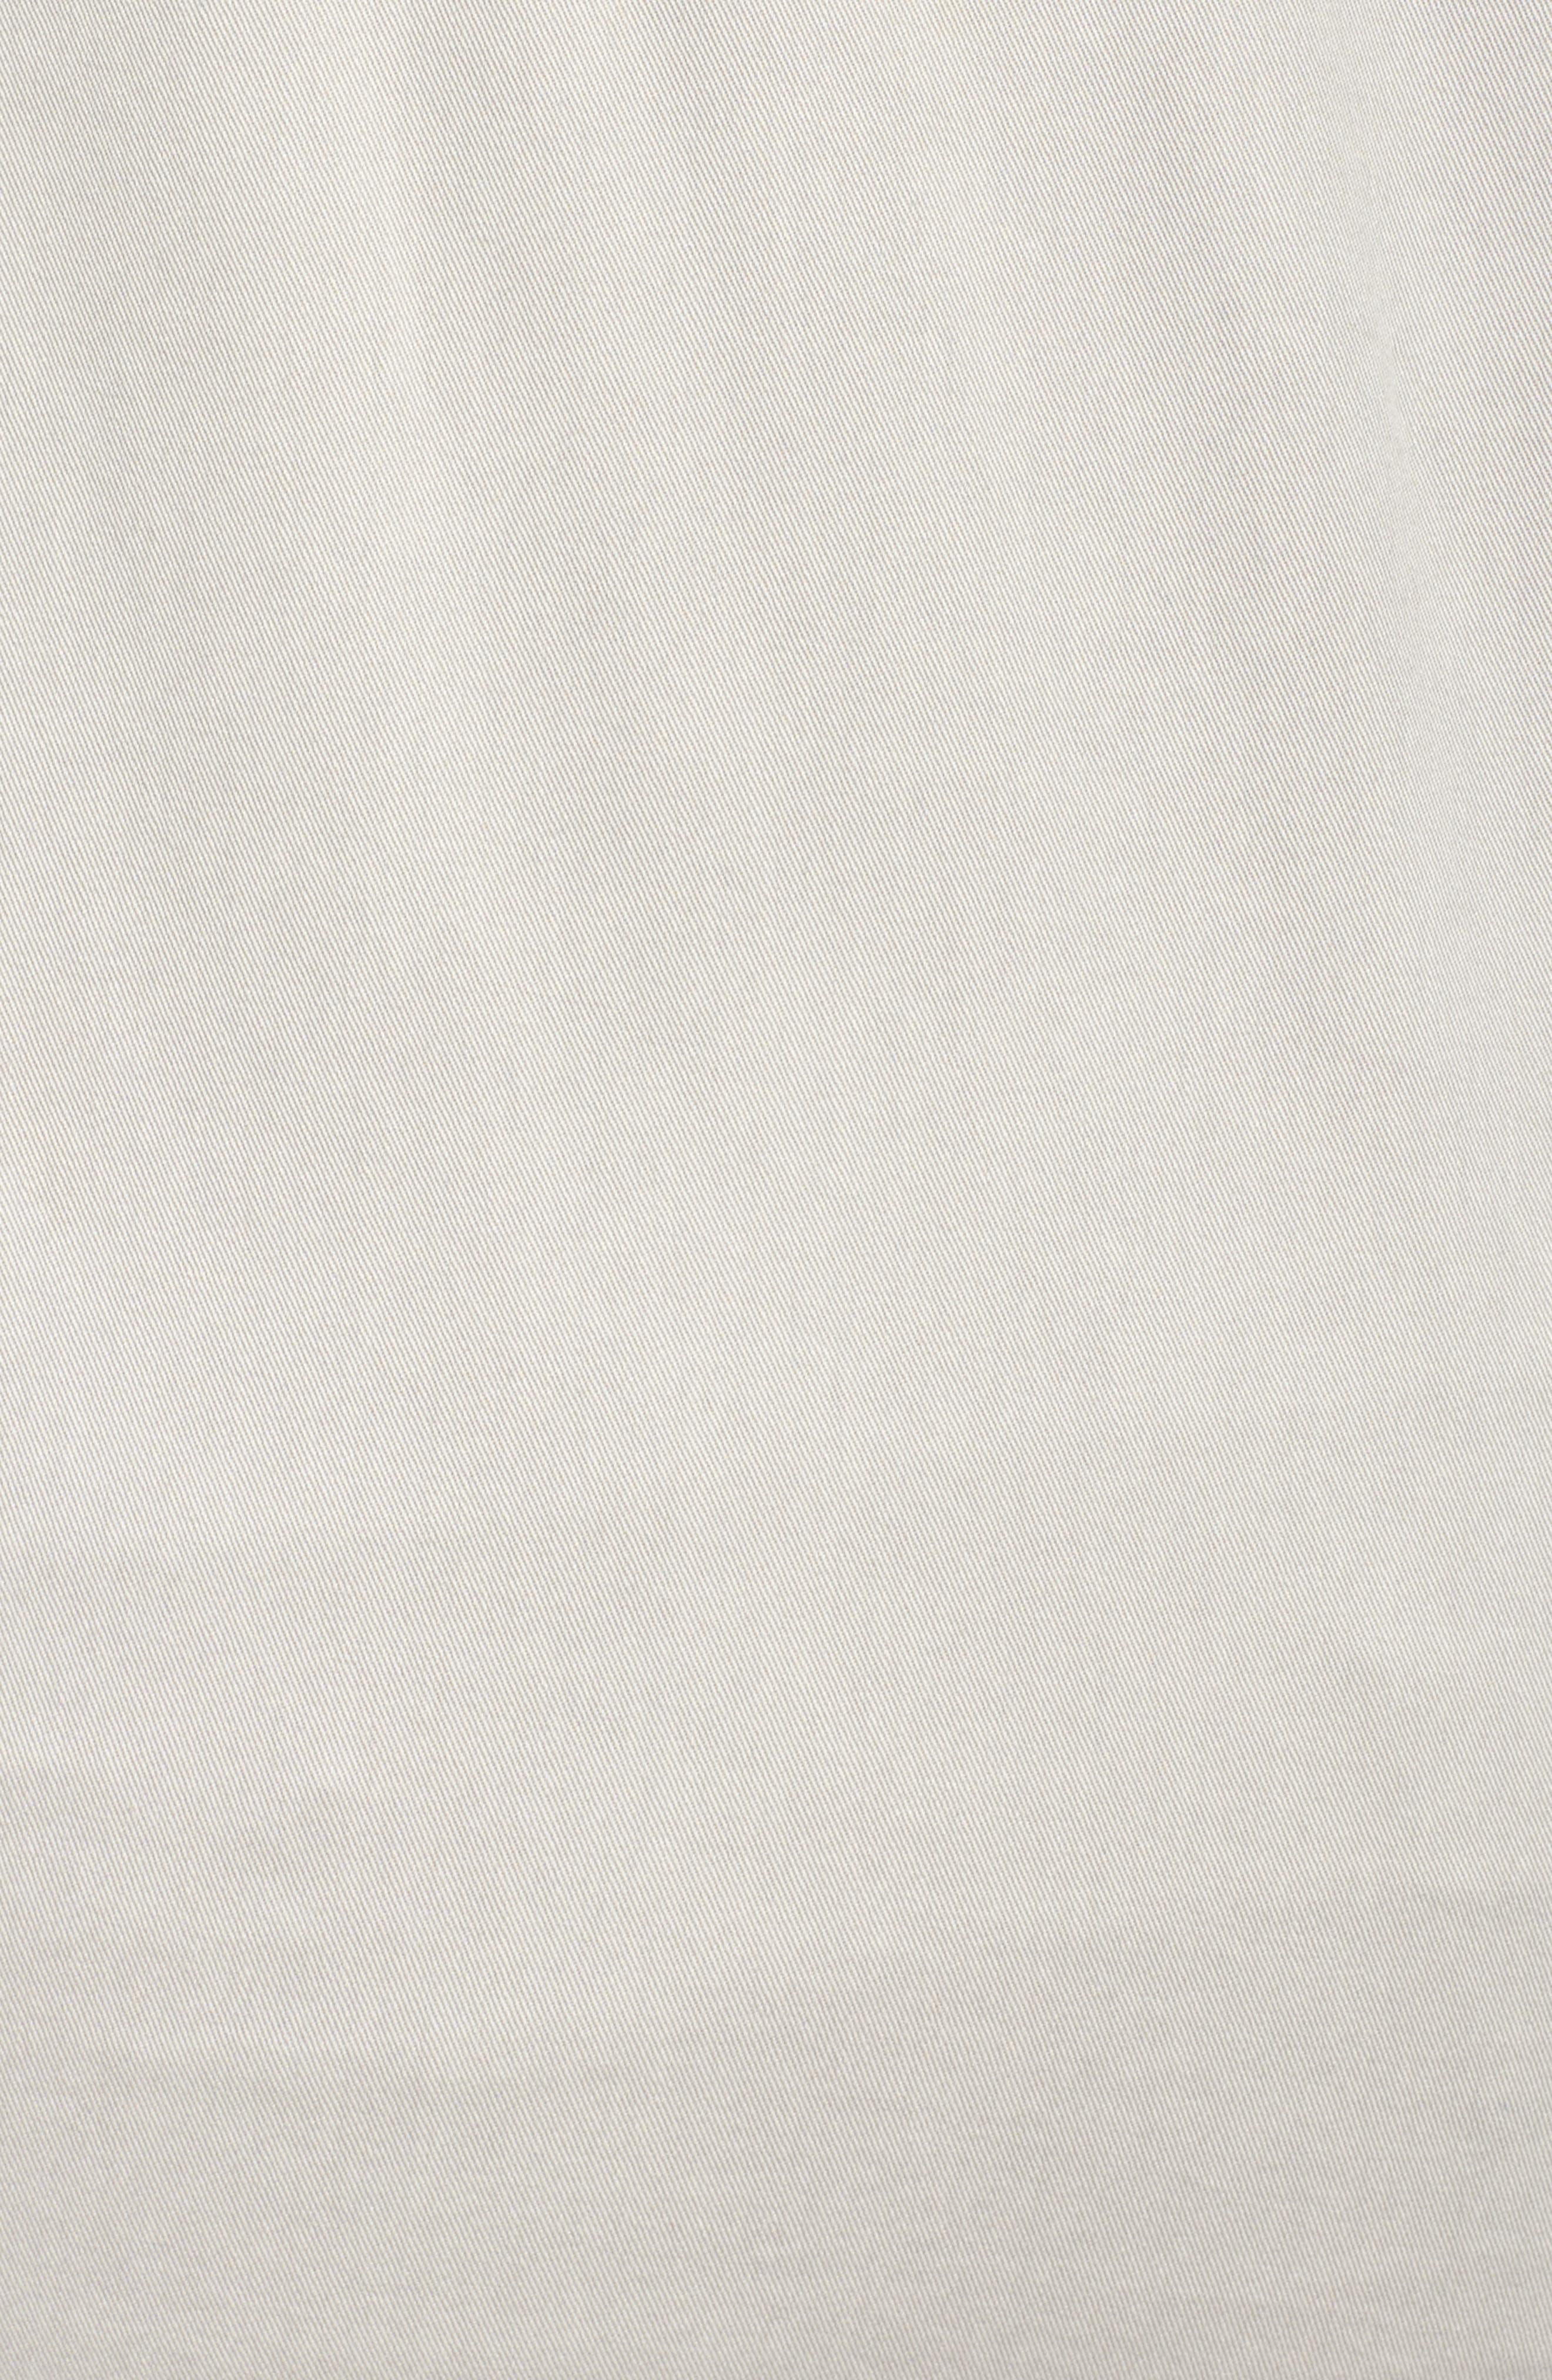 Oversize Cotton Canvas Trucker Jacket,                             Alternate thumbnail 6, color,                             030